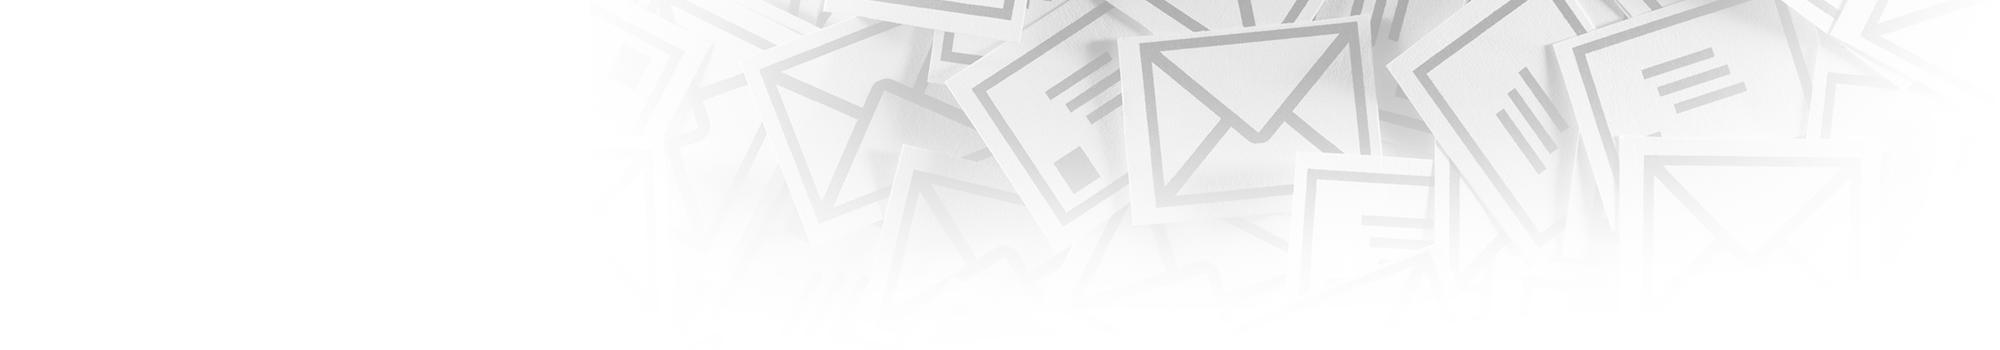 Header Image - Email Updates